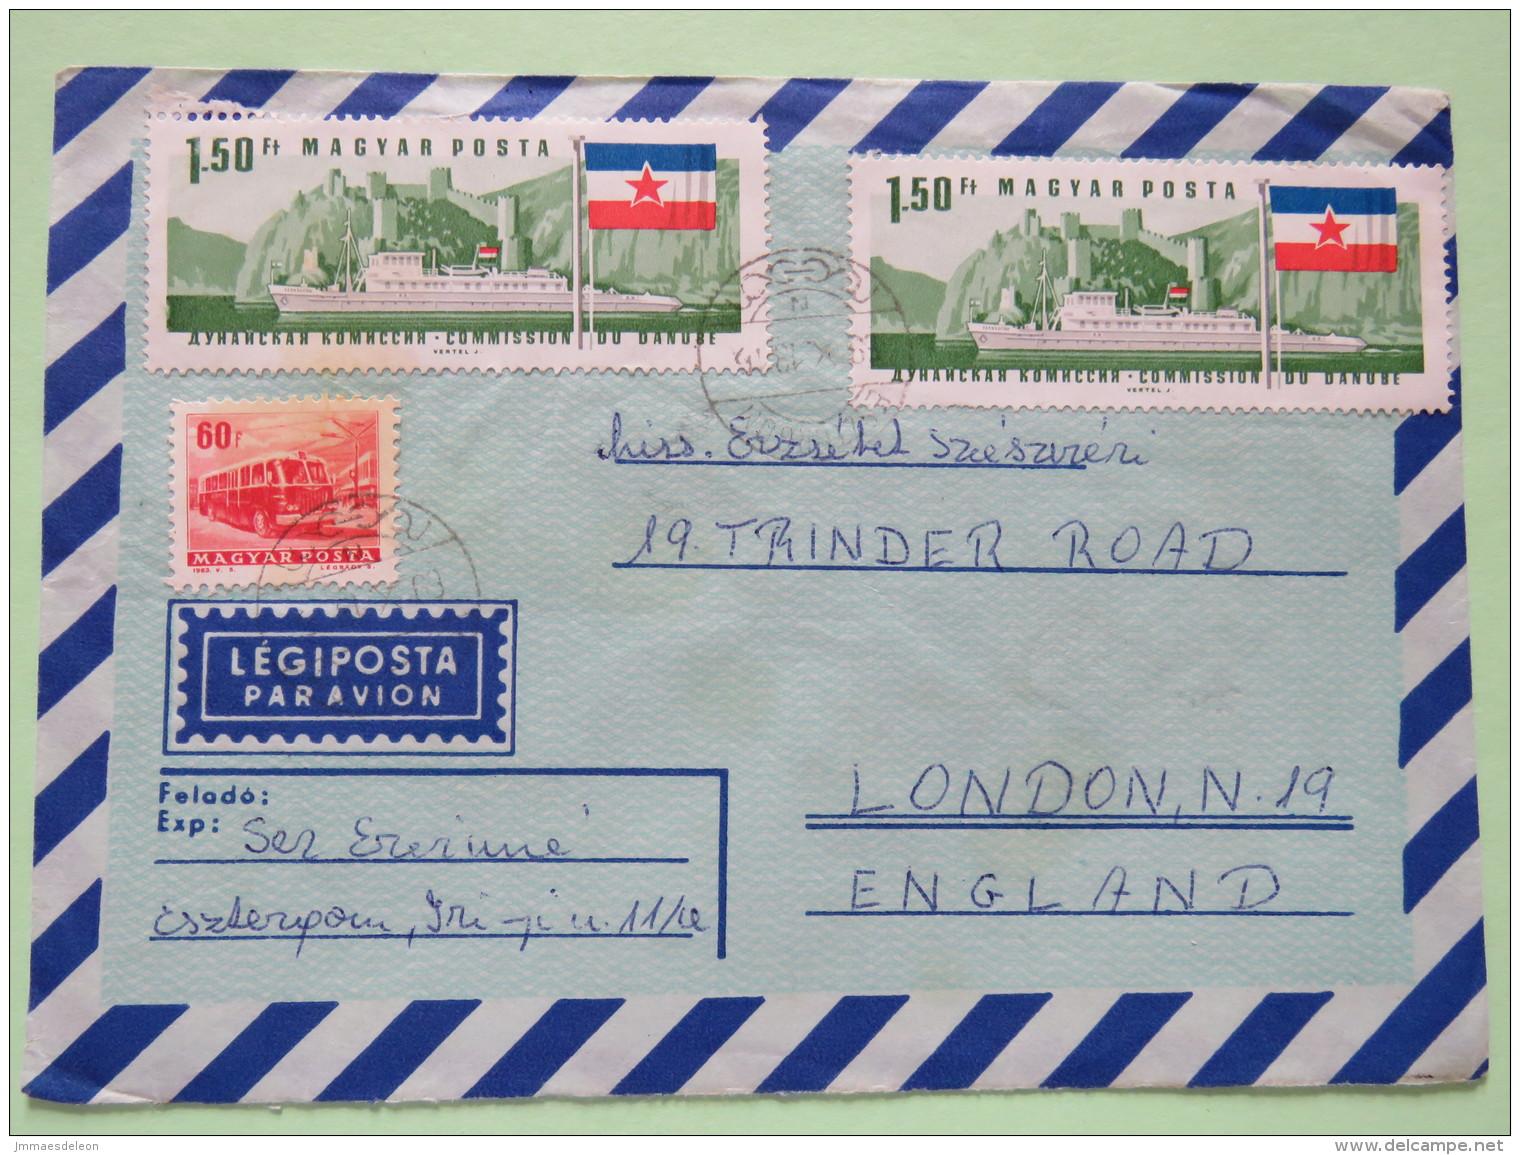 Hungary 1969 Cover Esztergem To England - Bus - Ships - Danube Comission - Flag - Hungary